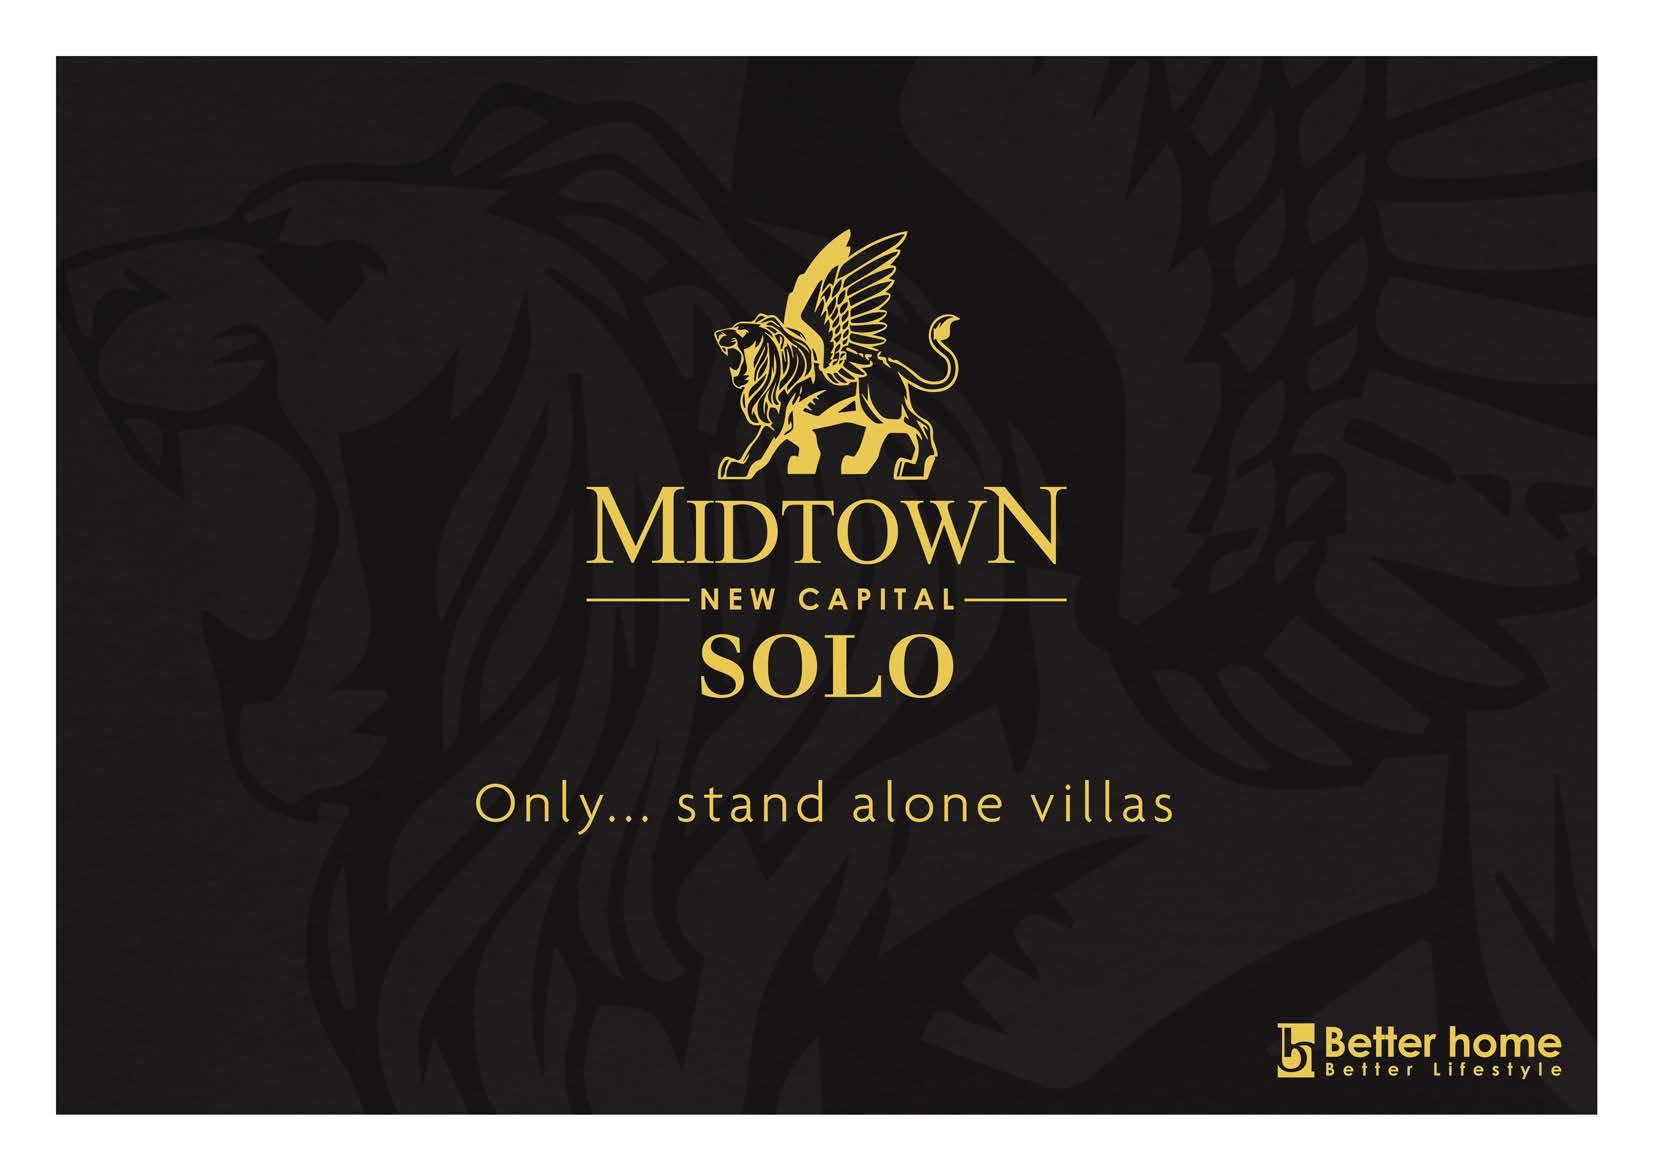 hotline midtown solo new capital